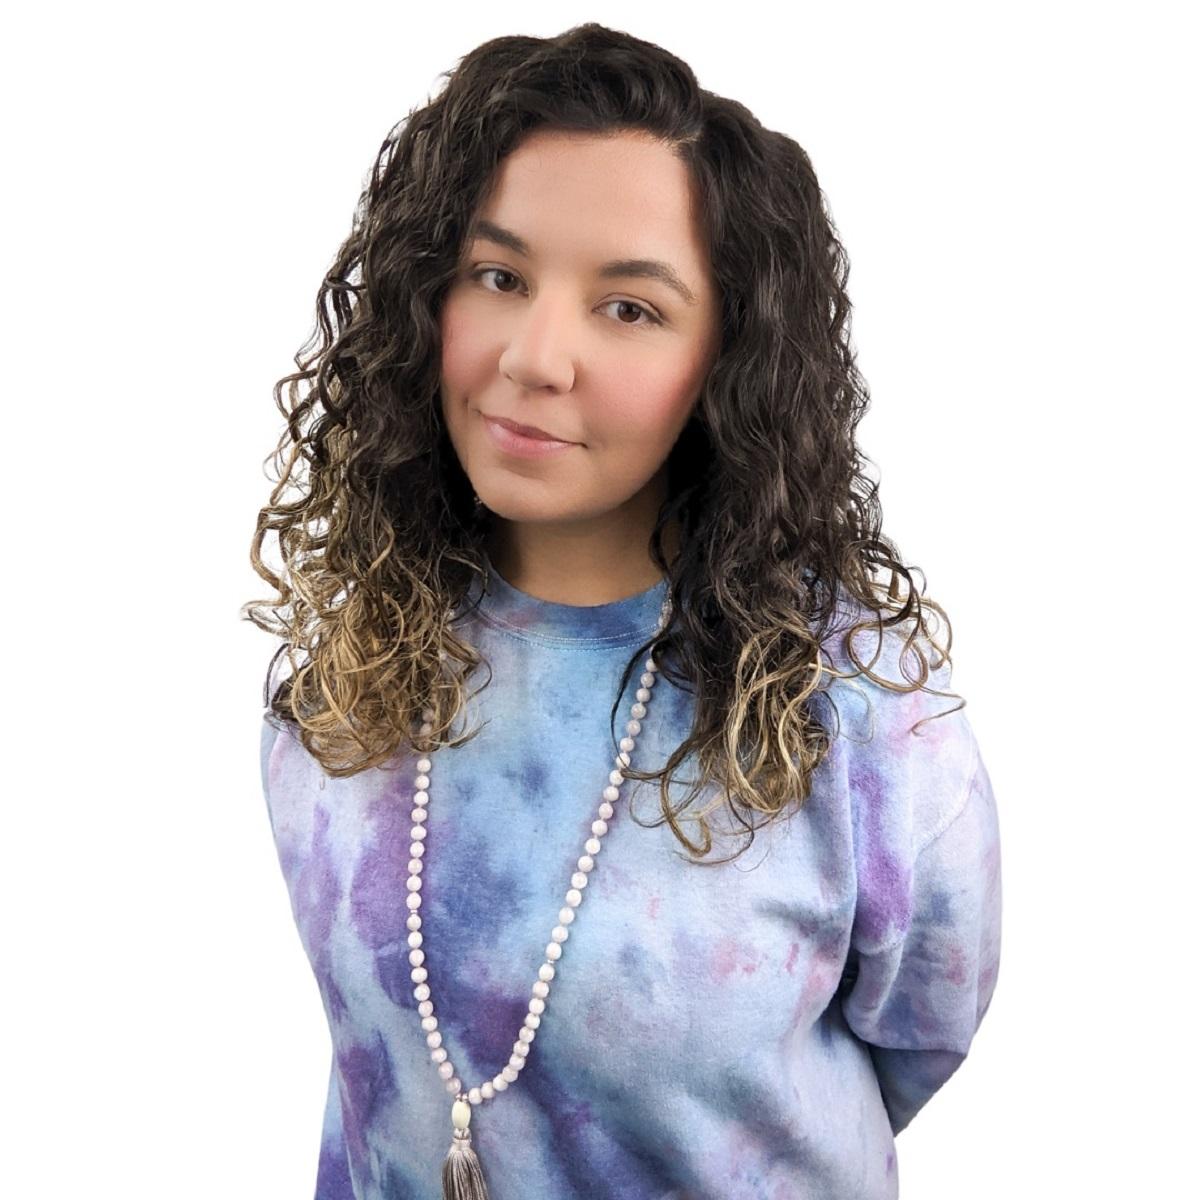 Edmonton jewelry designer, Suzie Qualle will have her creations featured at the Cordillera International Film Festival July 2021.